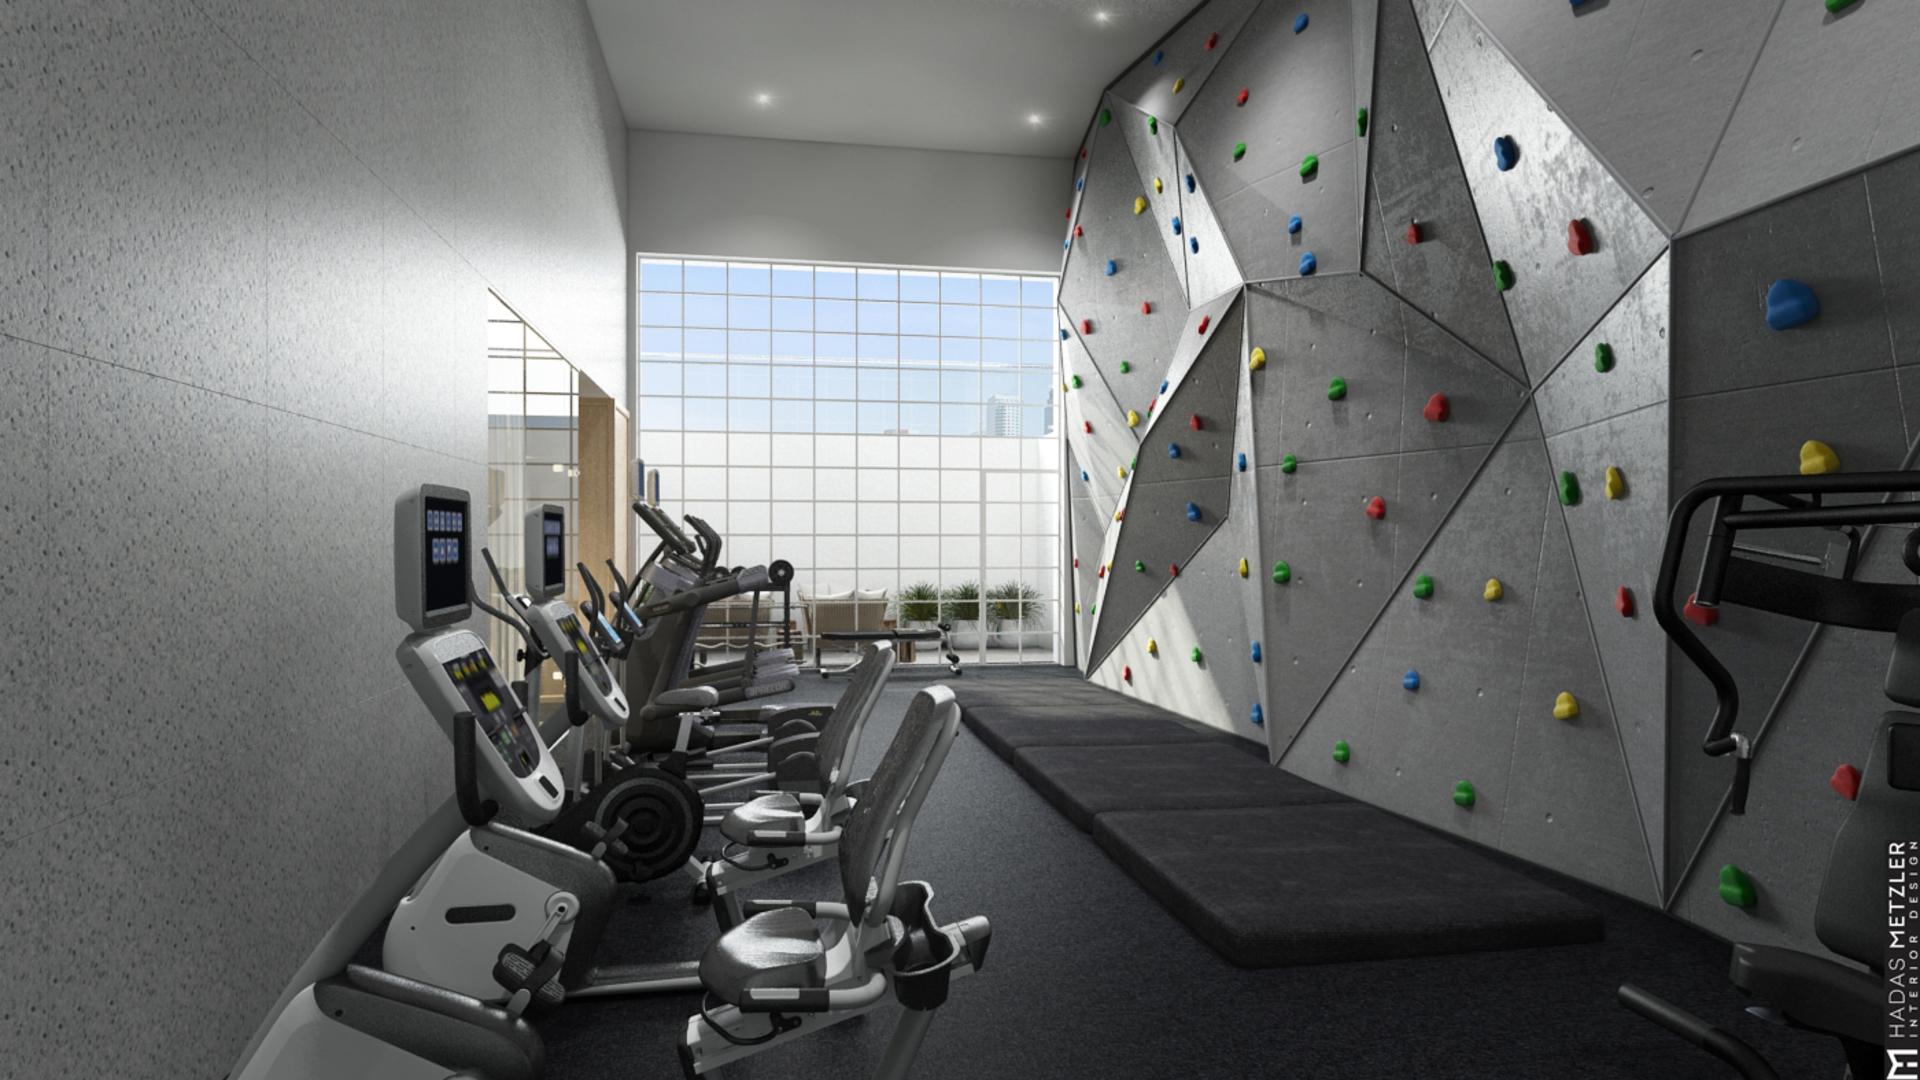 006 climbing wall